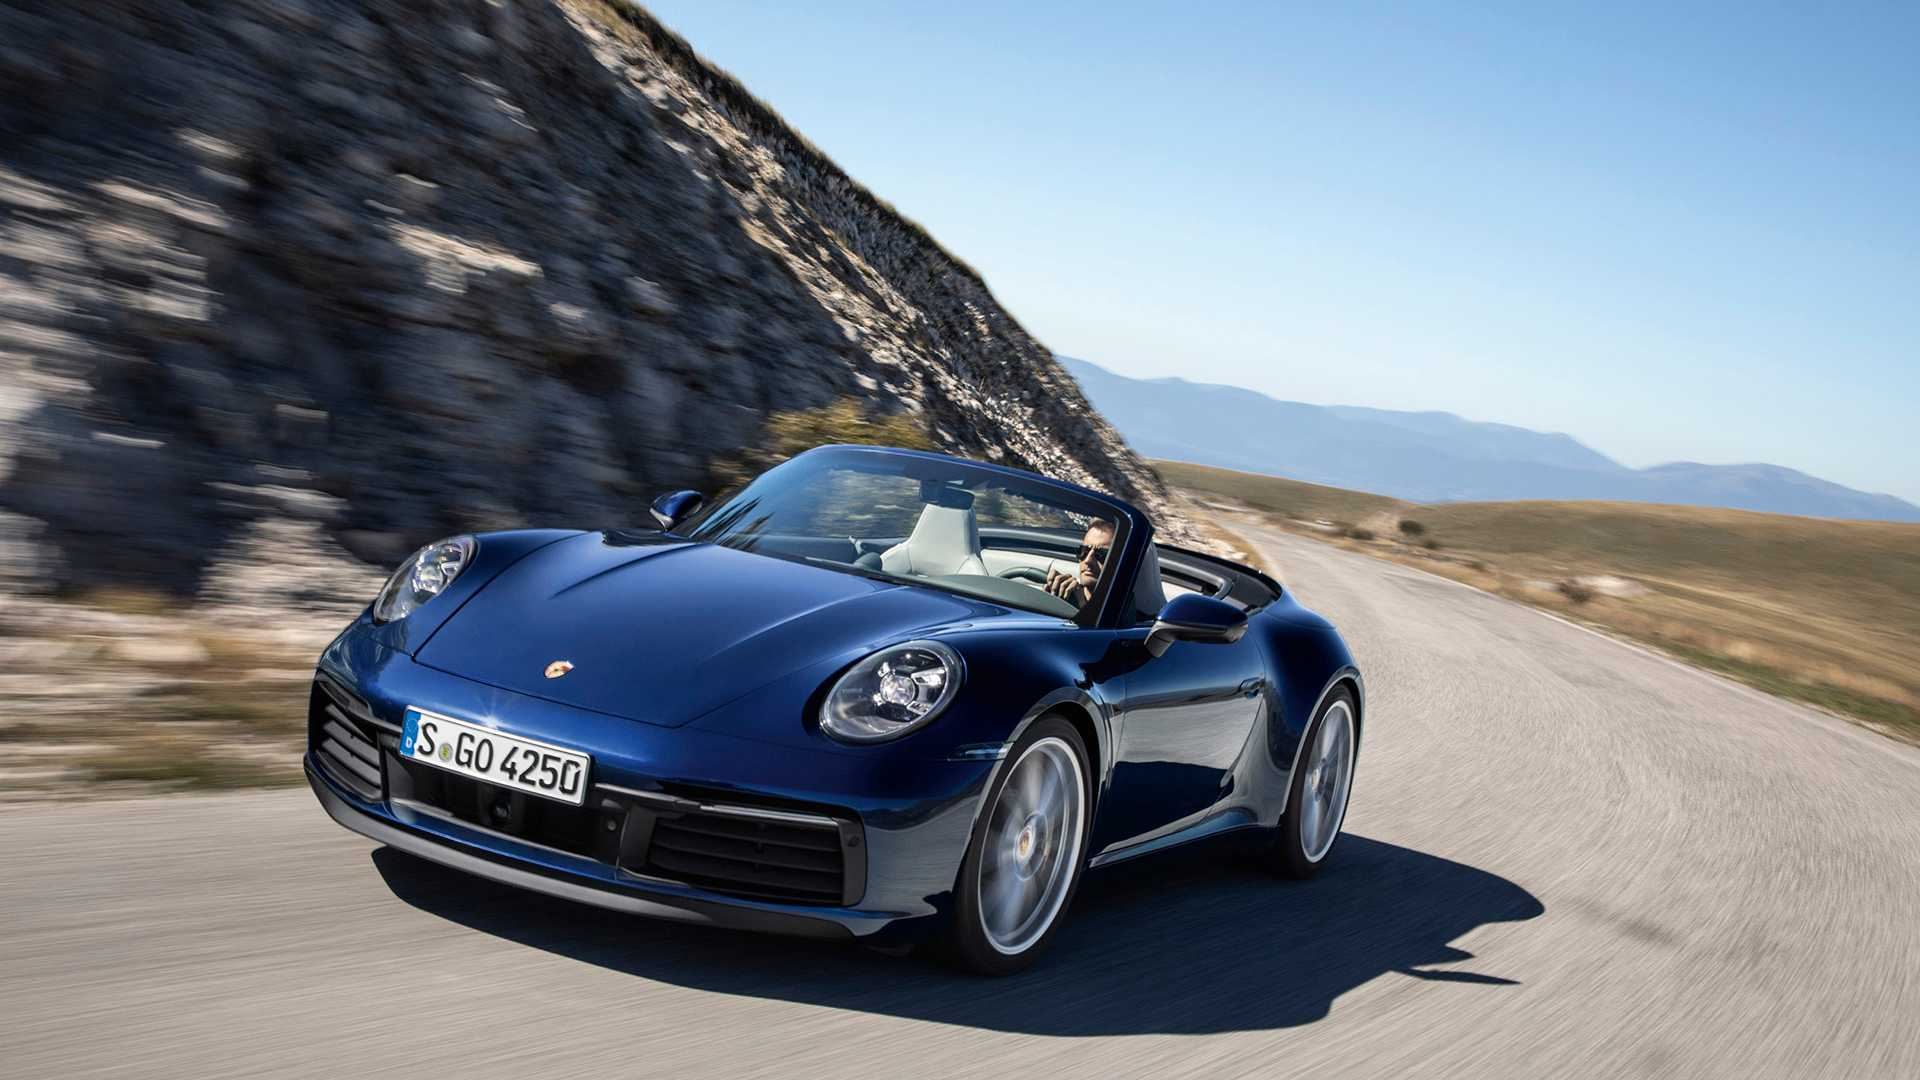 2020-porsche-911-cabriolet-trinh-lang-1.jpg